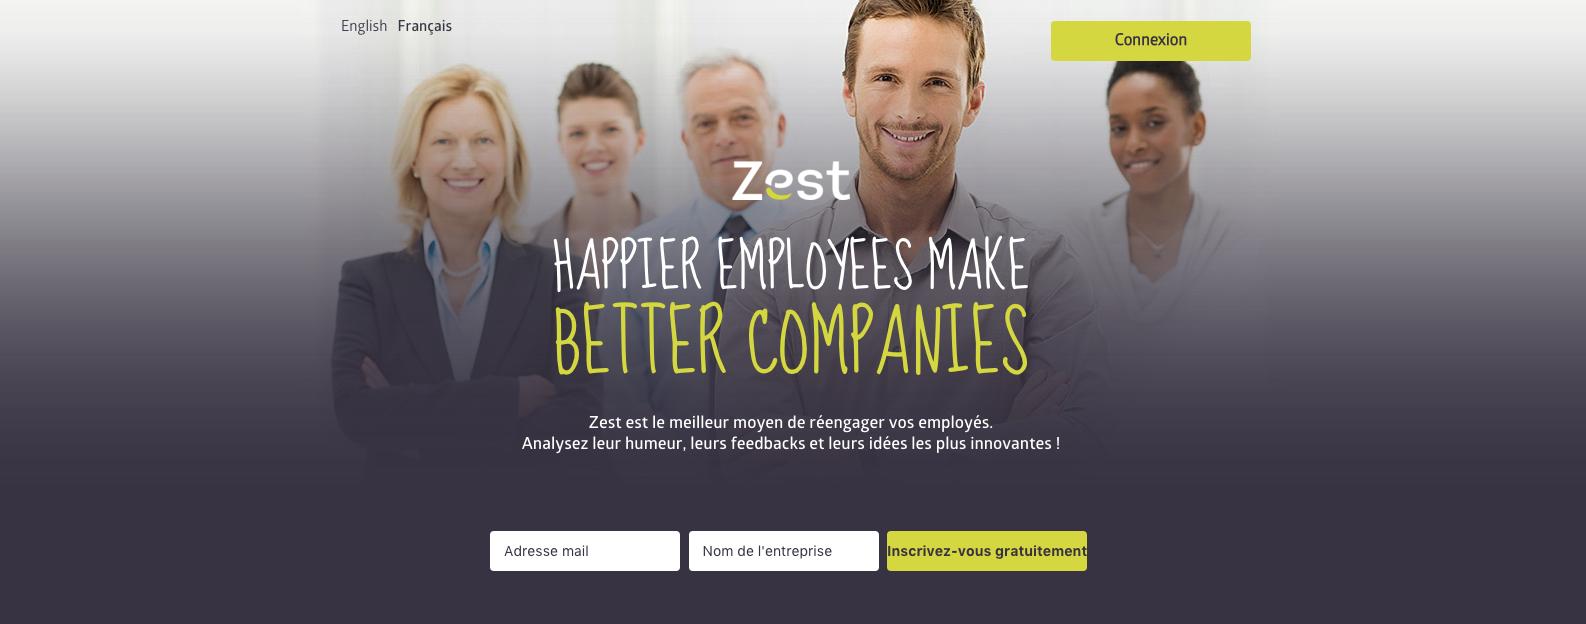 zest me pup startup 2017